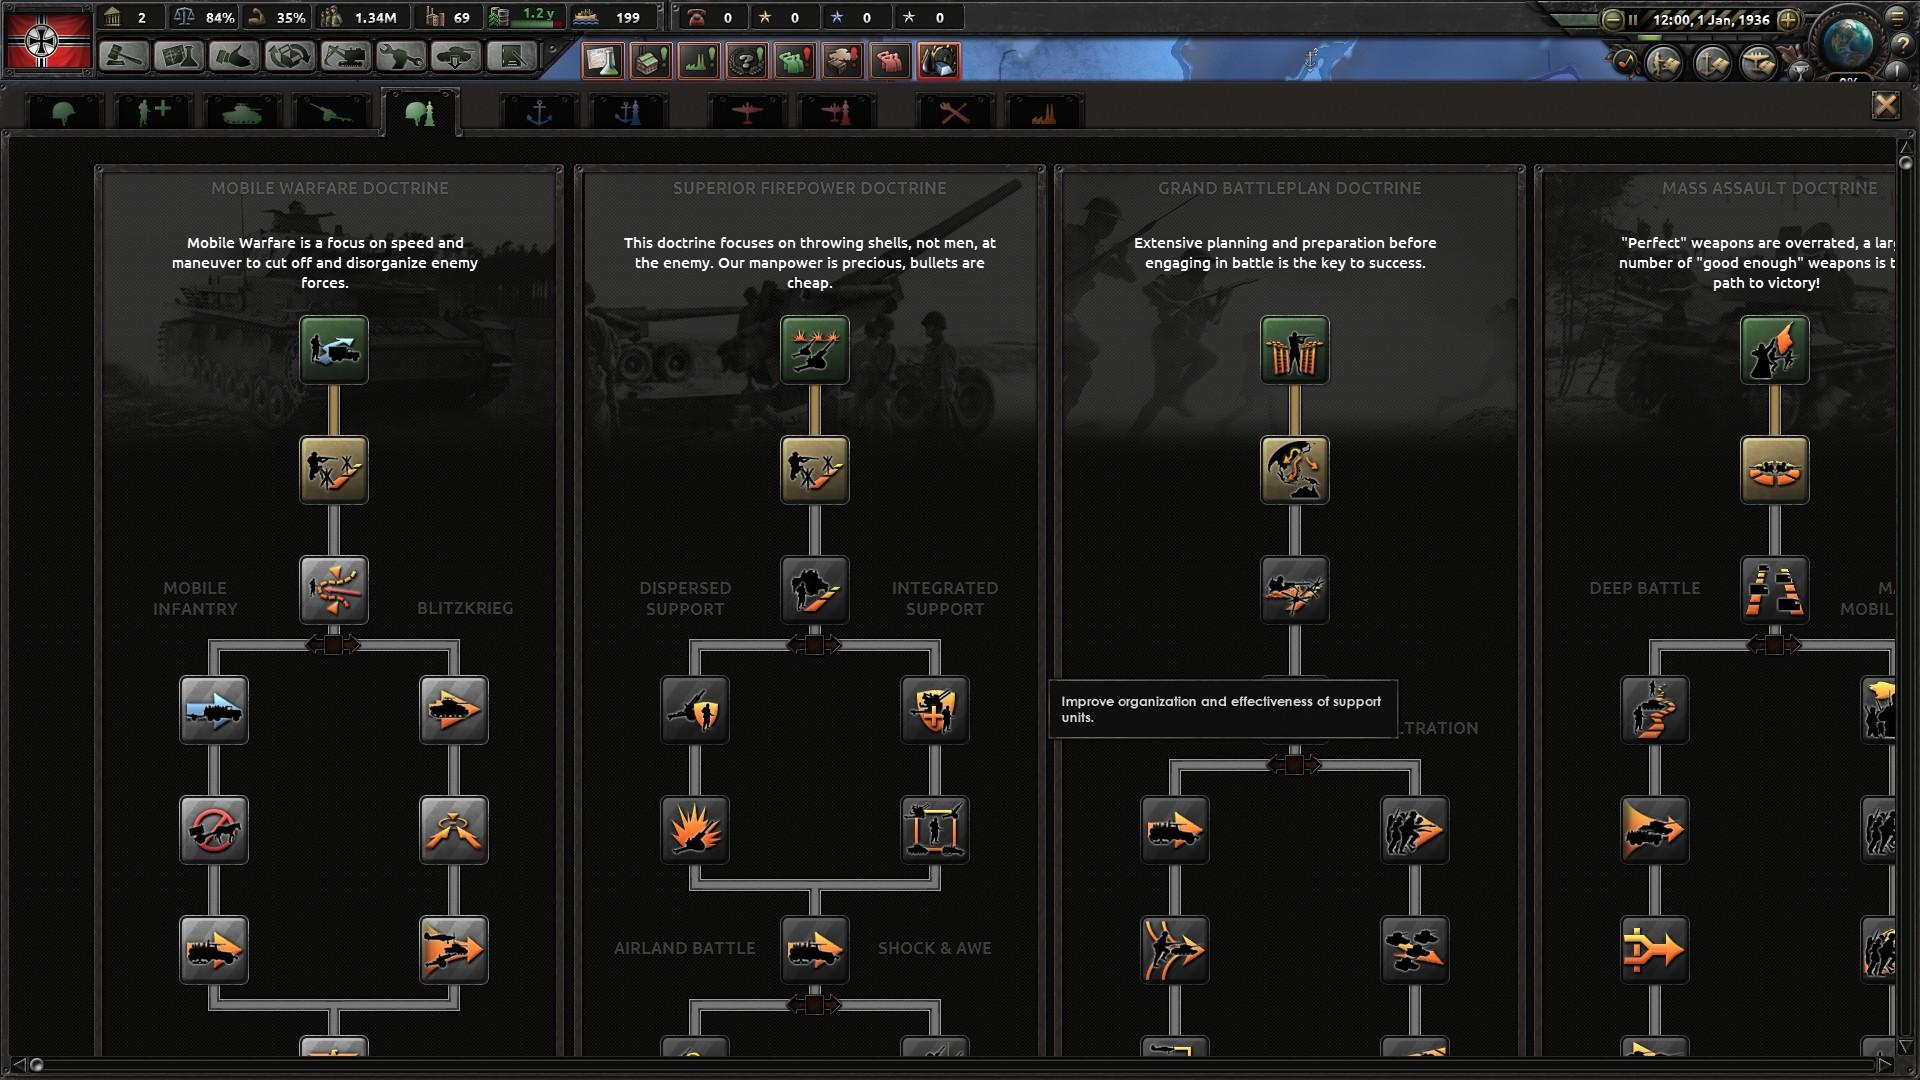 HOI4 Hydra 1 7 0 BETA patch [checksum: d12e] | Paradox Interactive